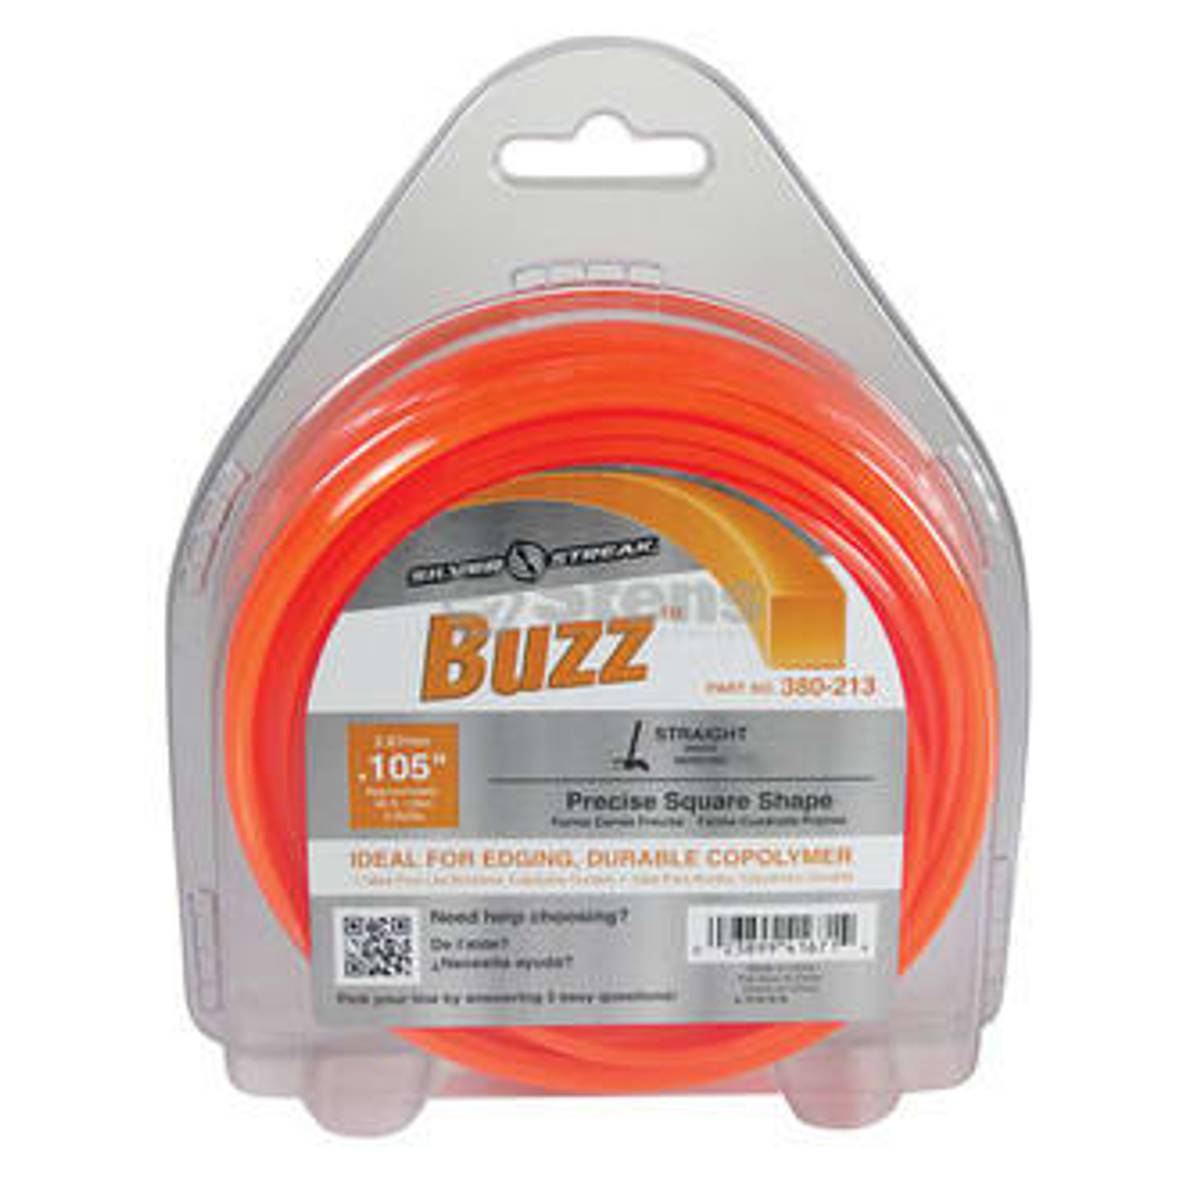 Stens trimmertråd Buzz 2,4mm x 82meter